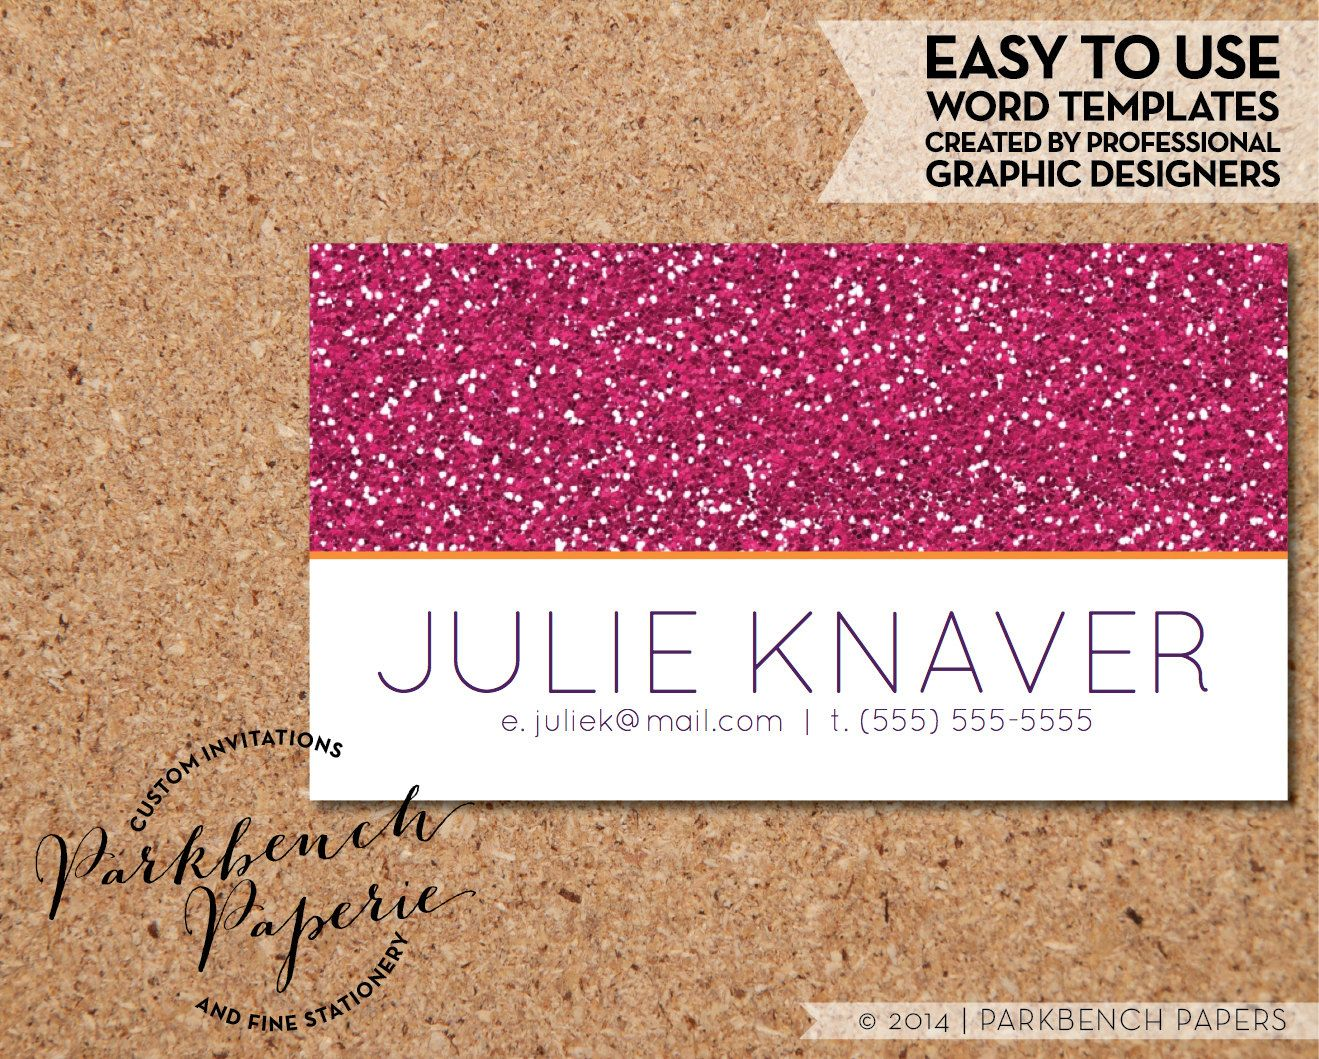 Business Card Template - Pink Glitter - DIY Editable Word Template ...